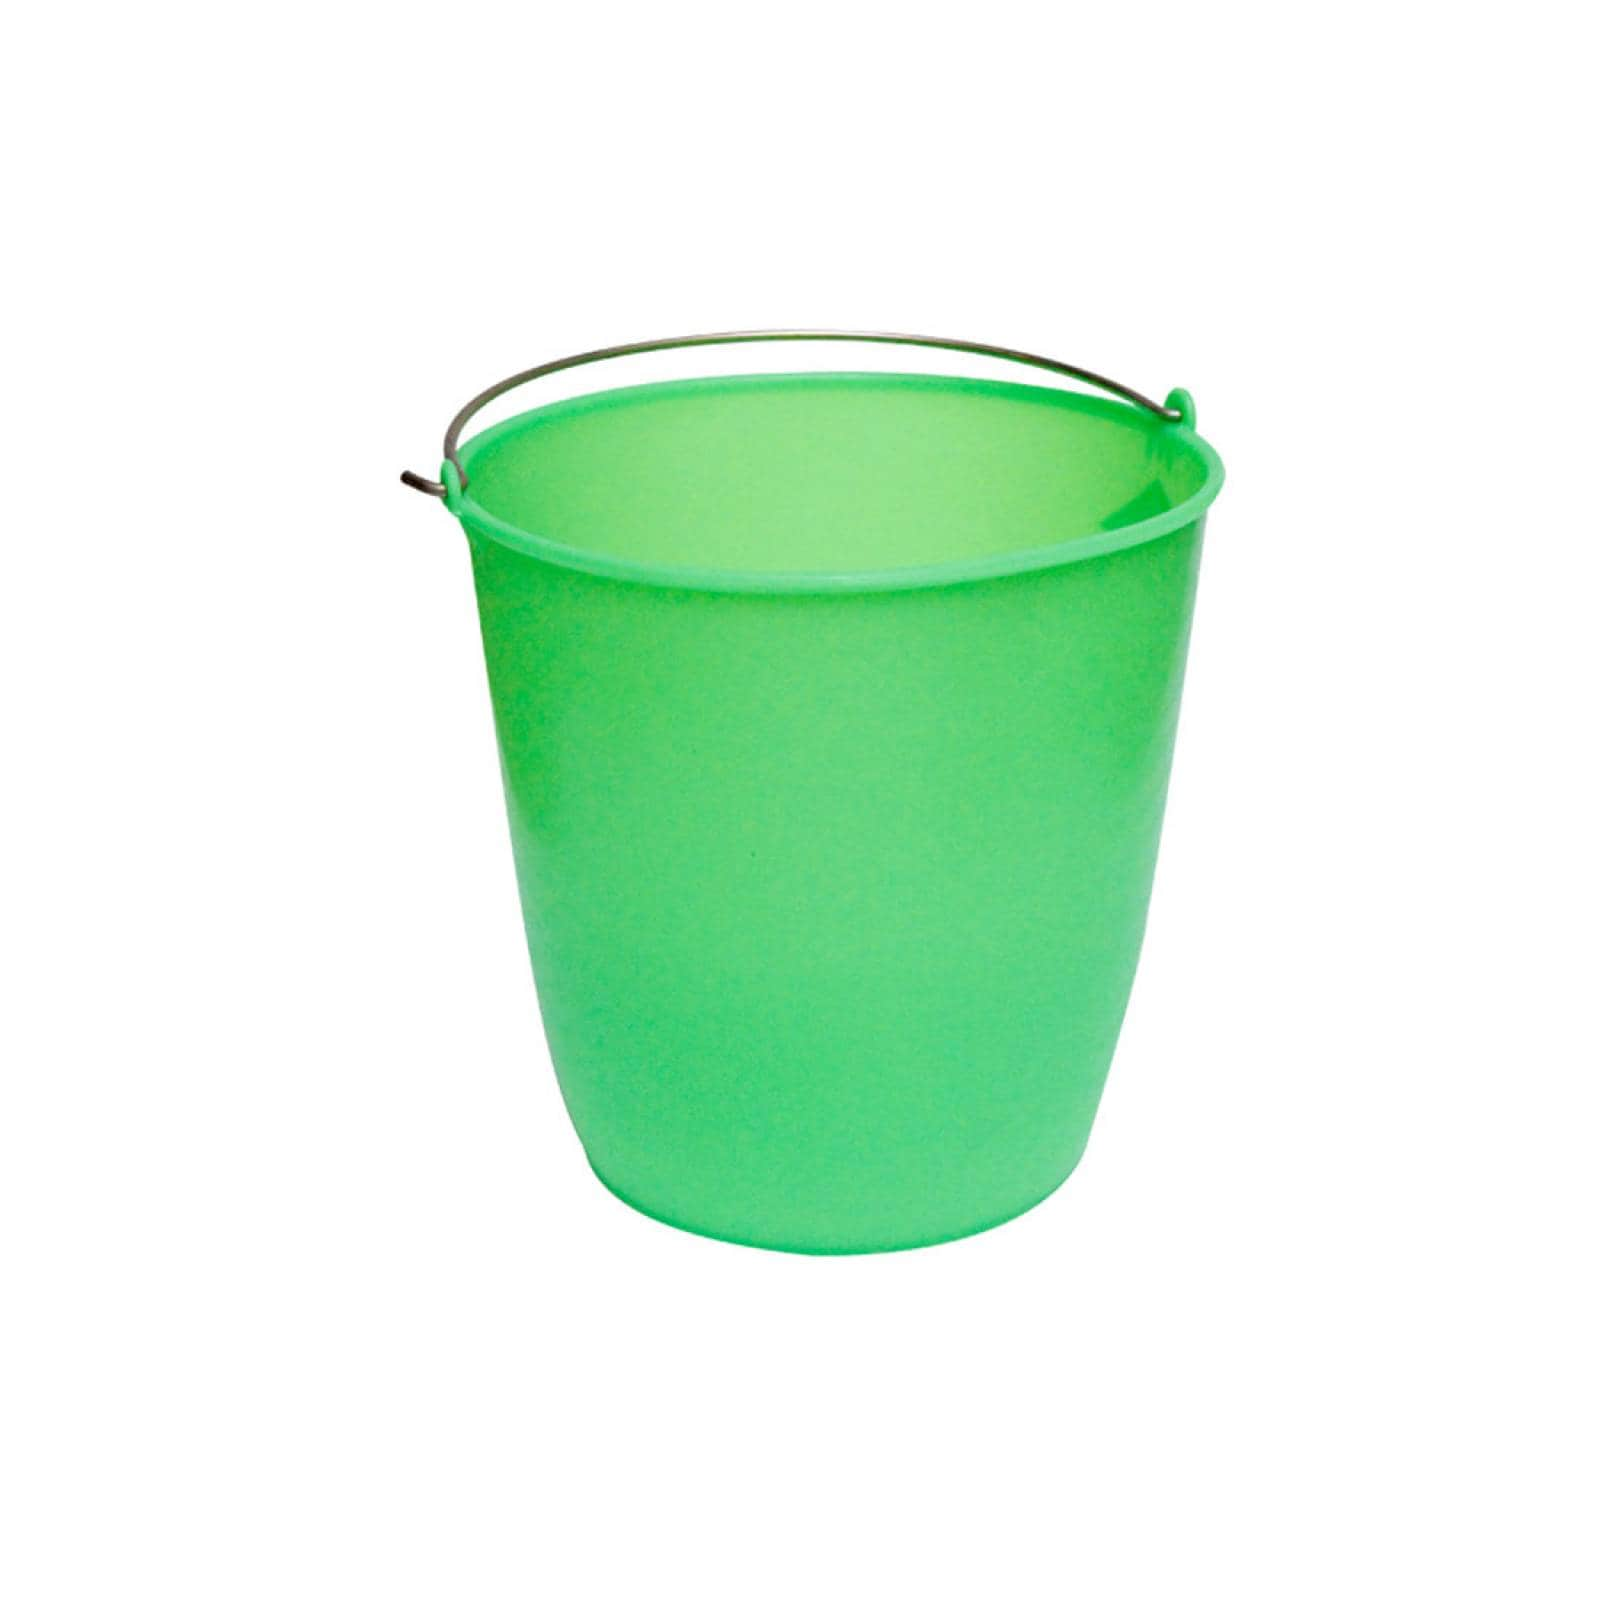 Cubeta Flexible N° 14 Plástico Limpieza Torosqui Assorted